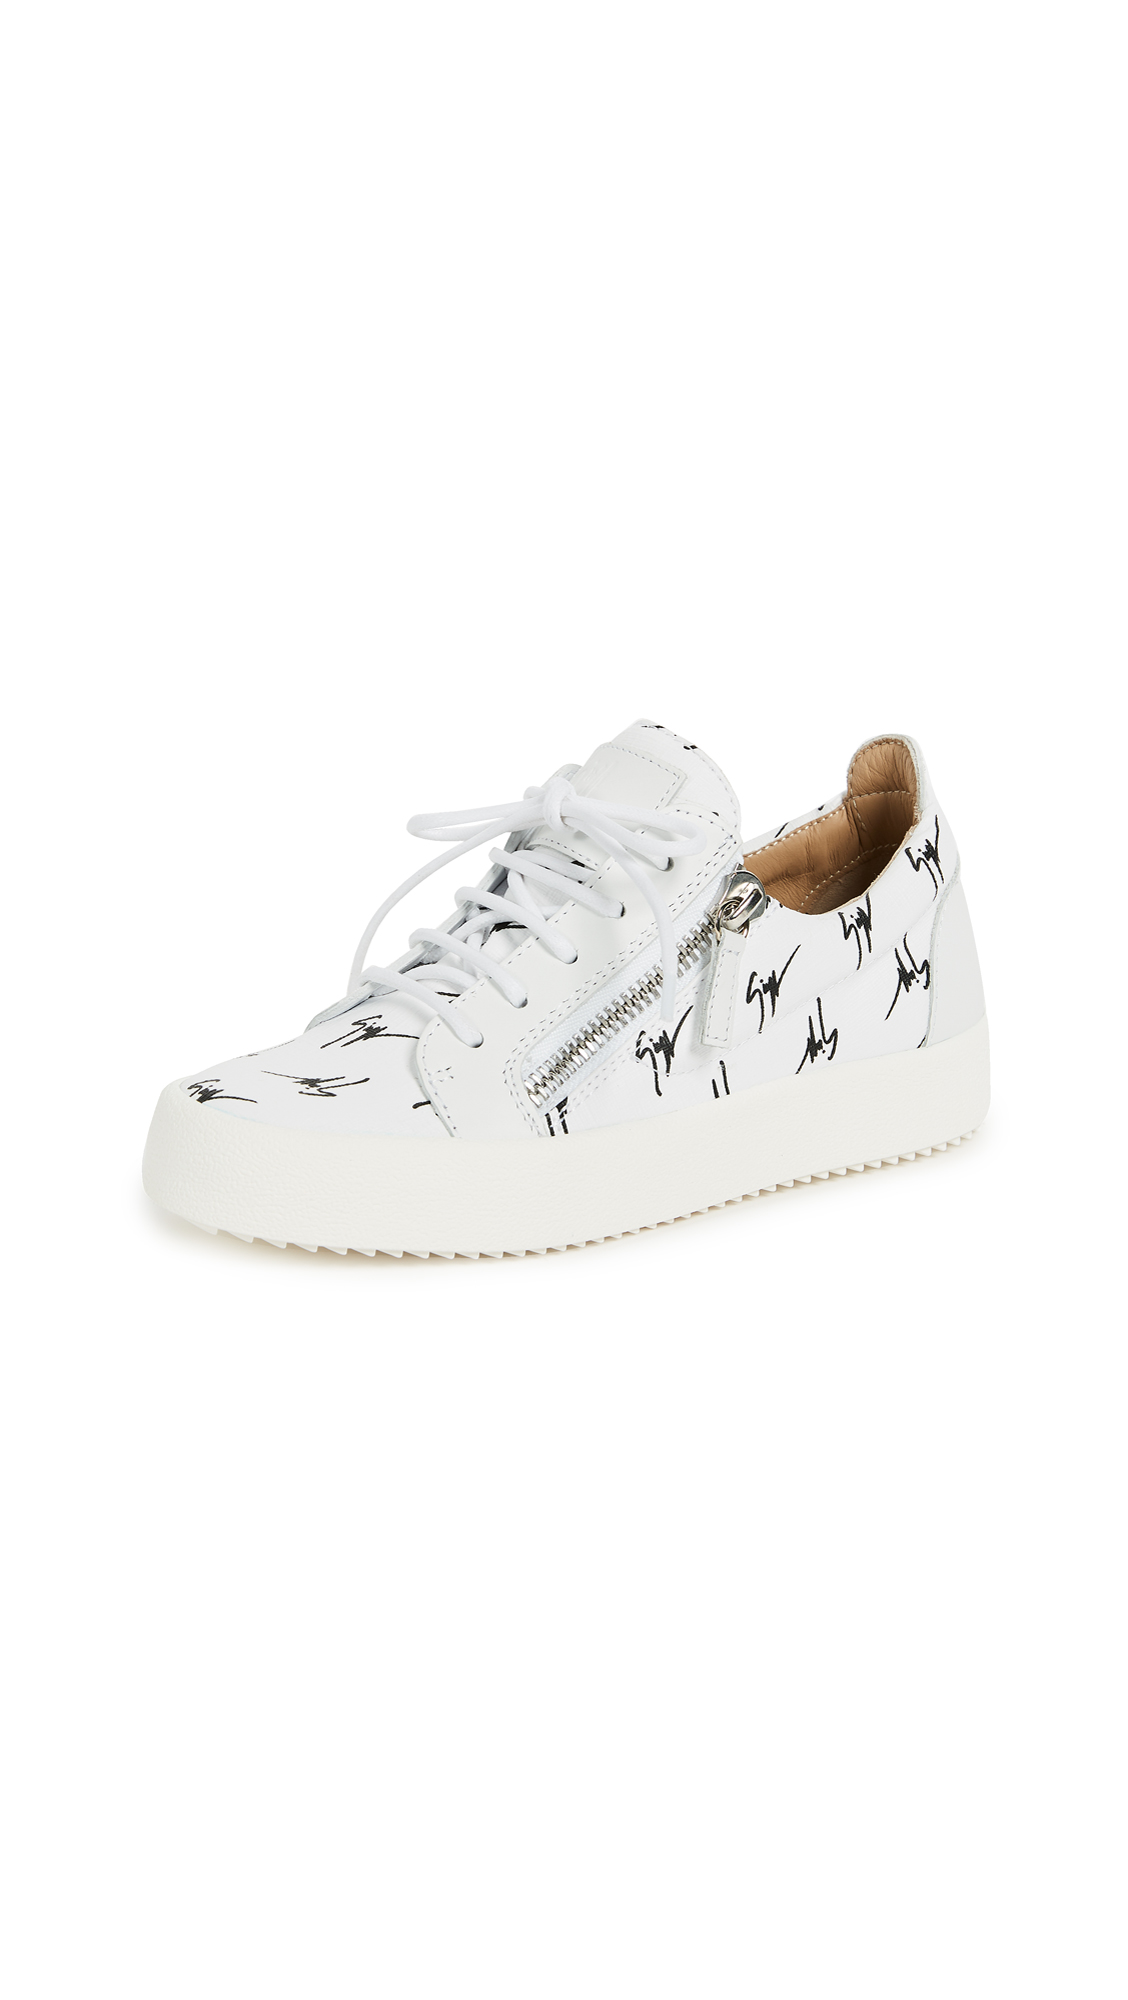 Giuseppe Zanotti Zip Sneakers - Bianco/Nero